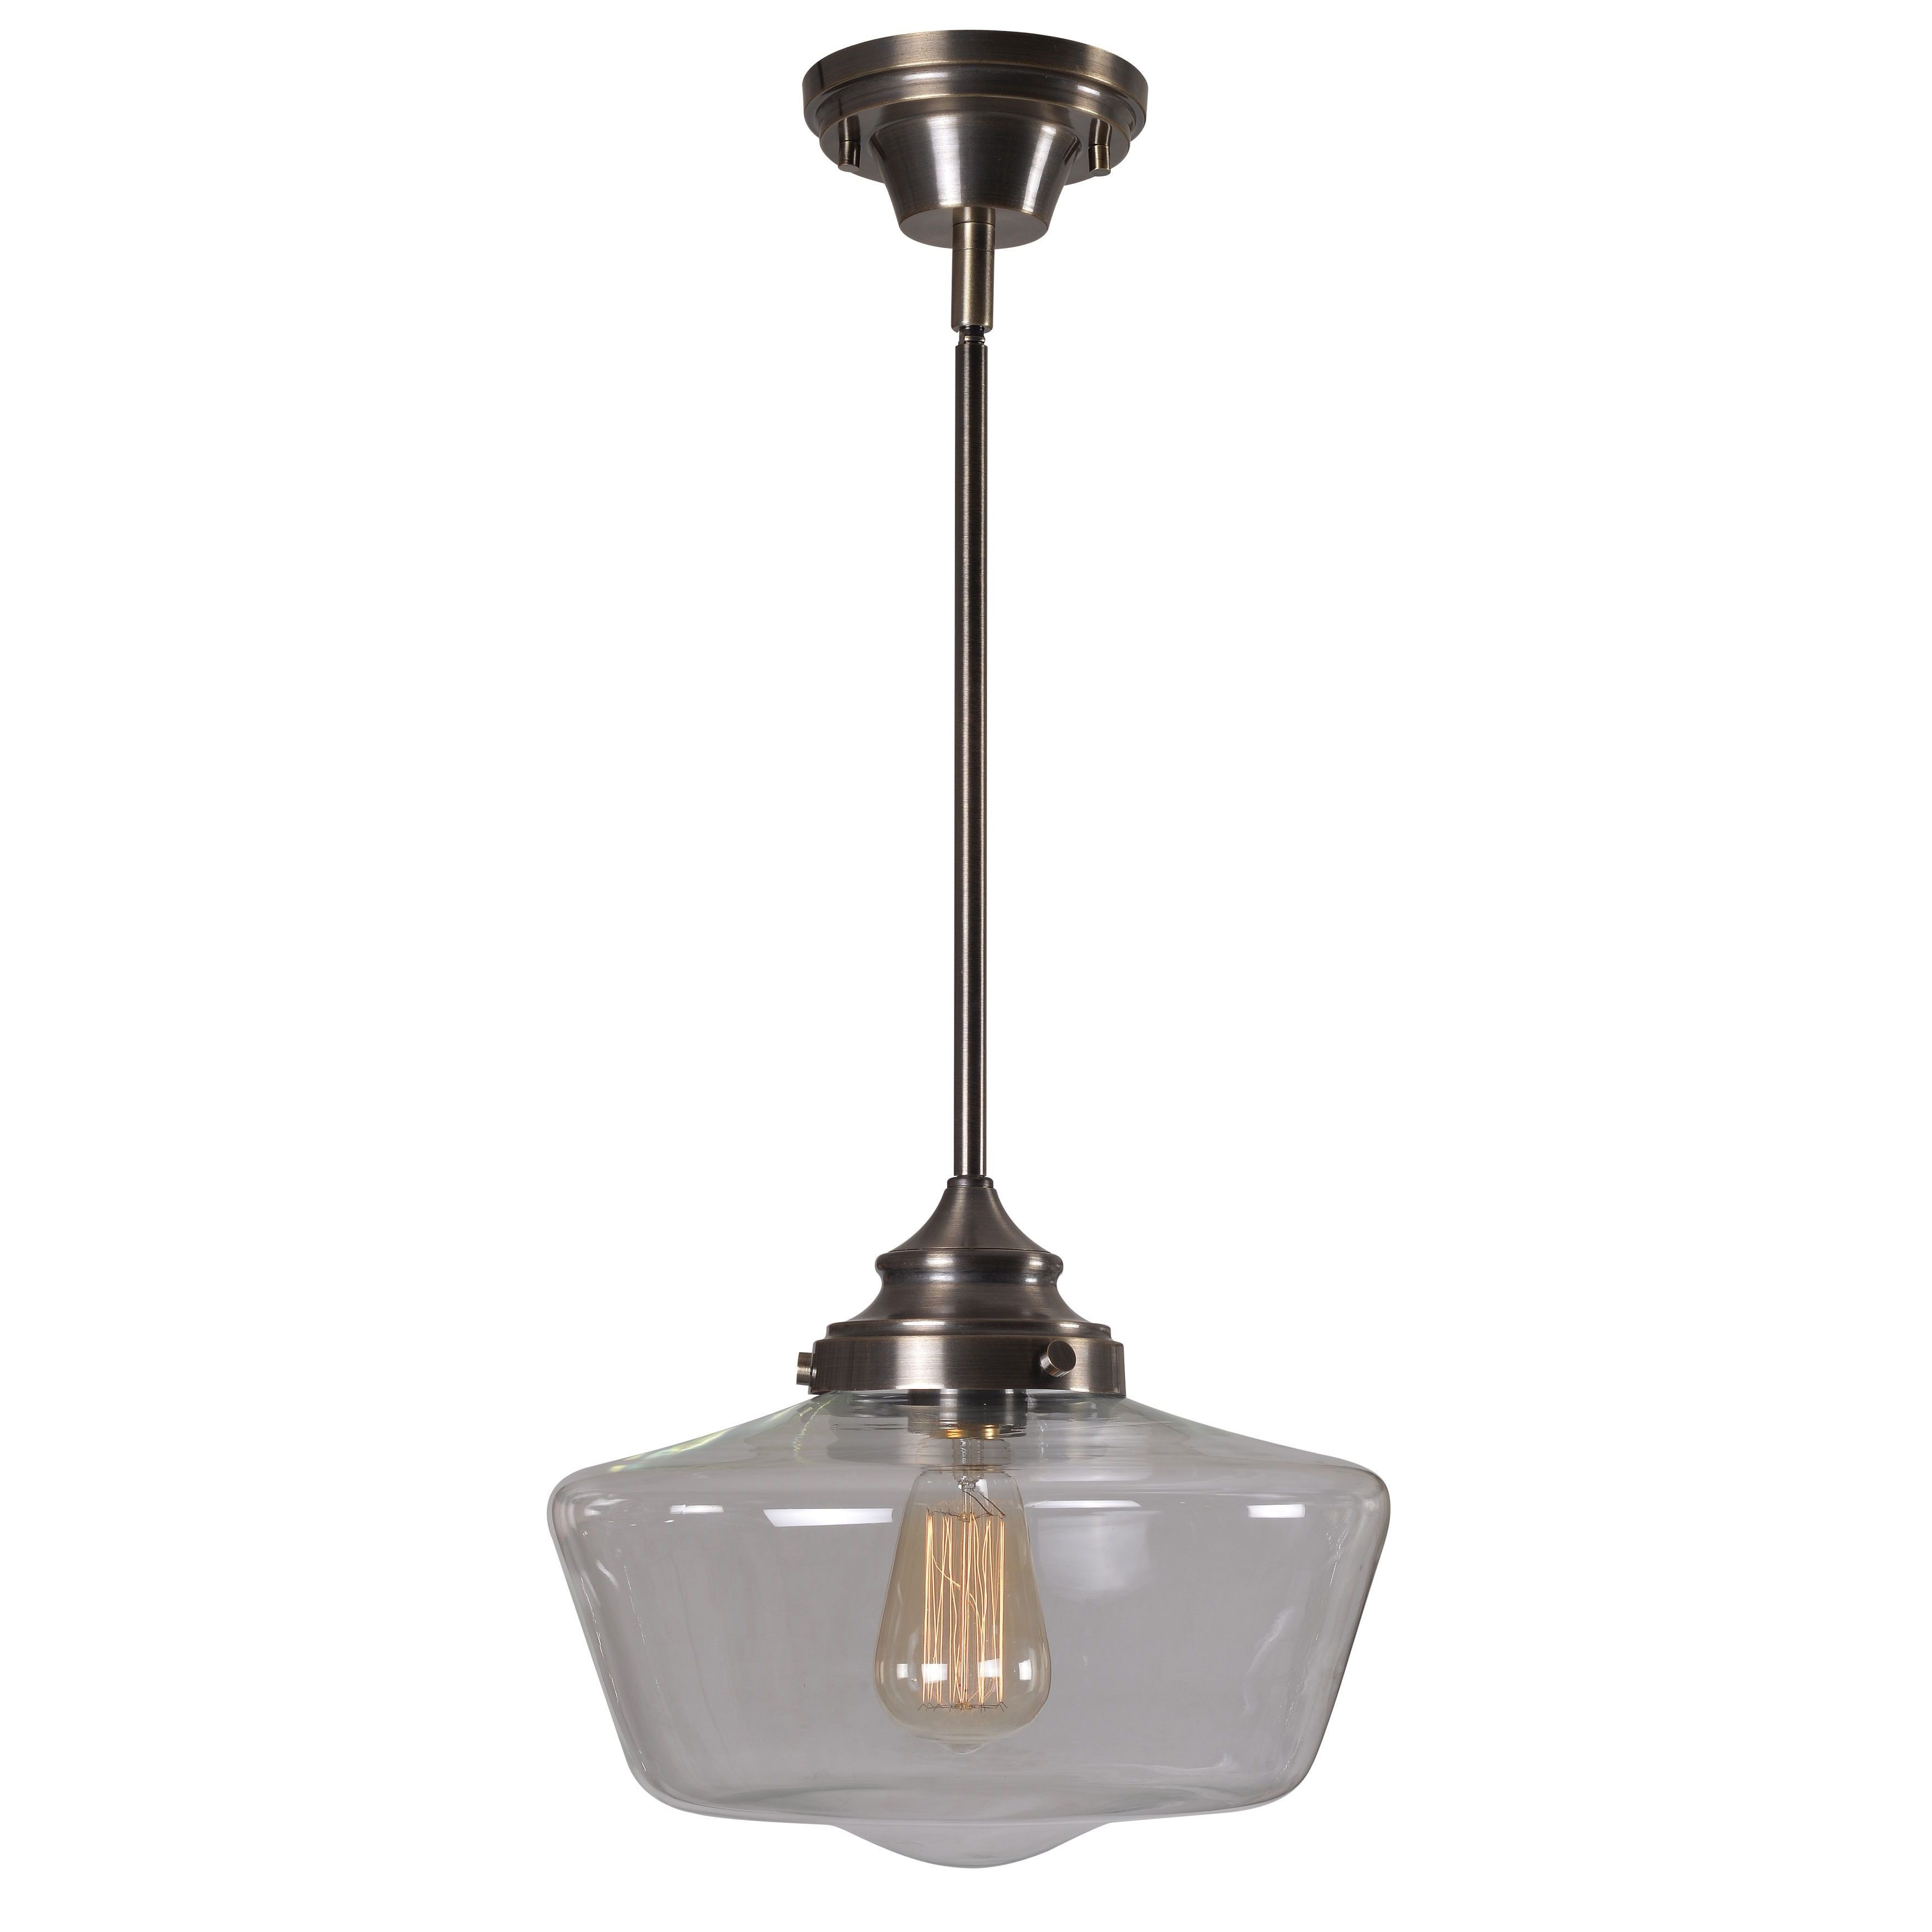 Design Craft Hallow 1-light Pendant (Hallow 1 light penda...